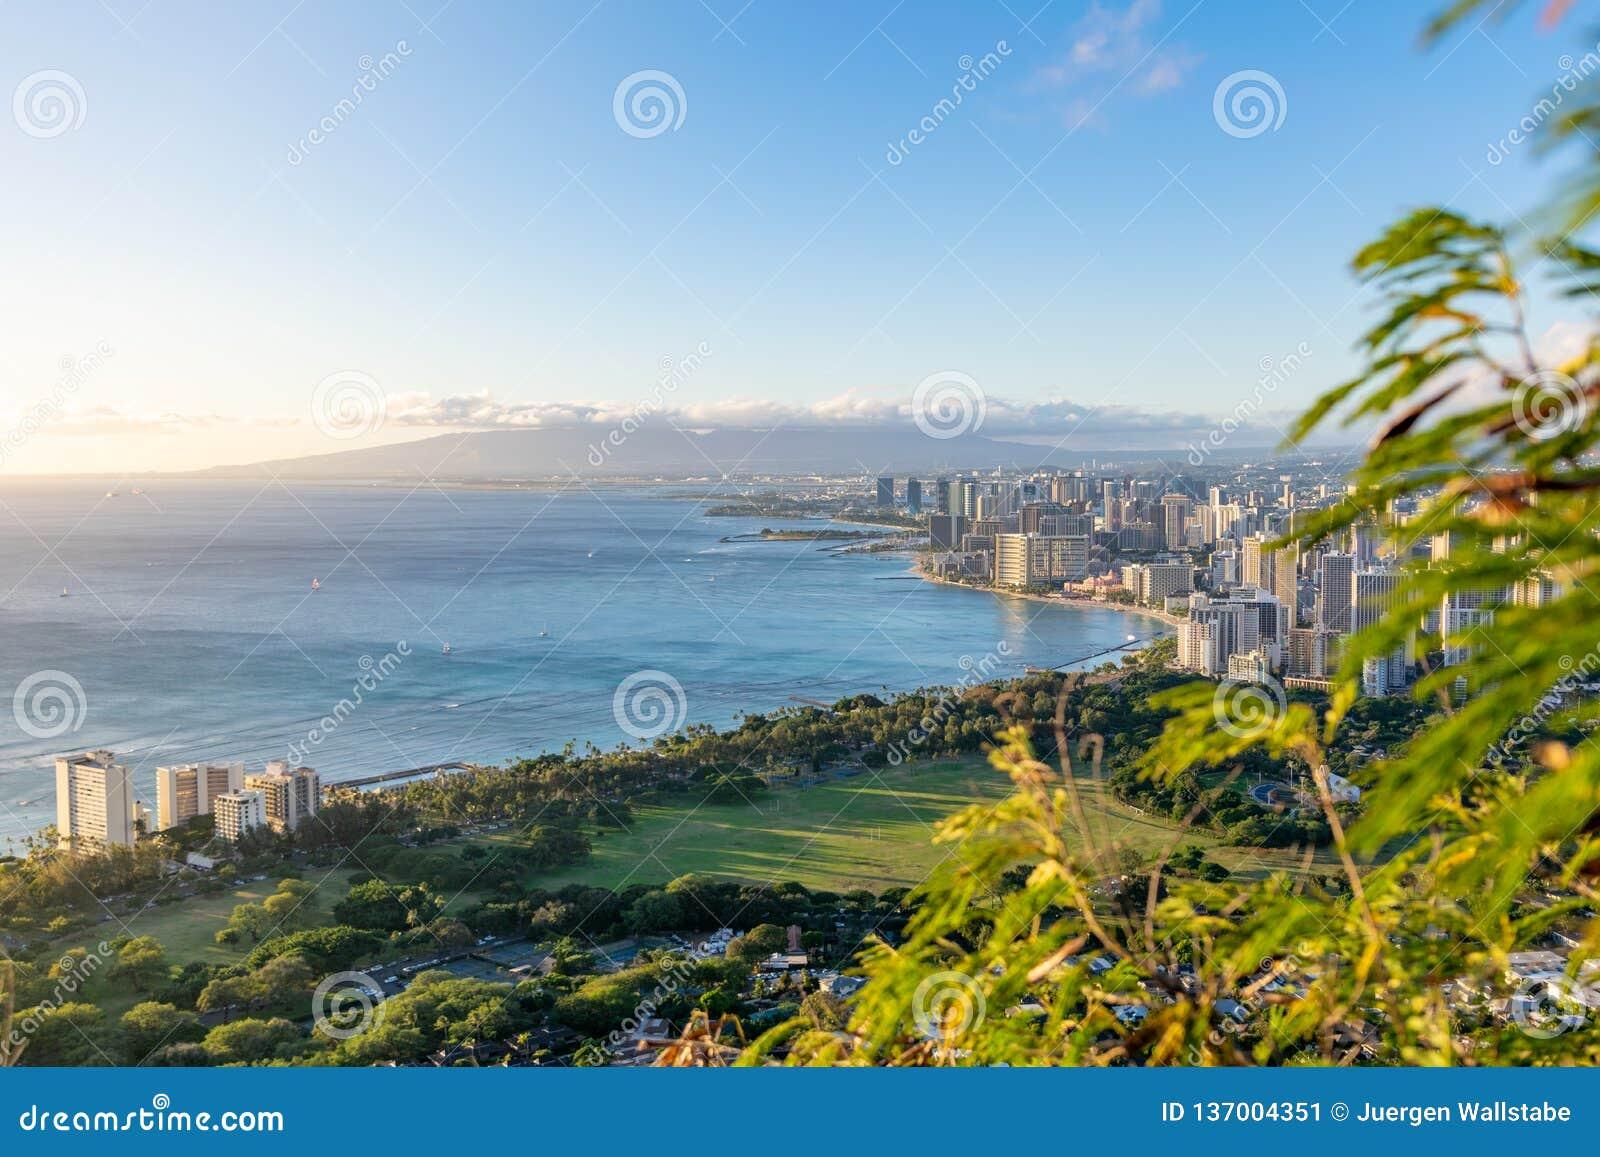 Overweldigende die mening van het Strand van Honolulu en Waikiki-van de top van Diamond Head Crater, Oahu, Hawaï wordt gezien Moo